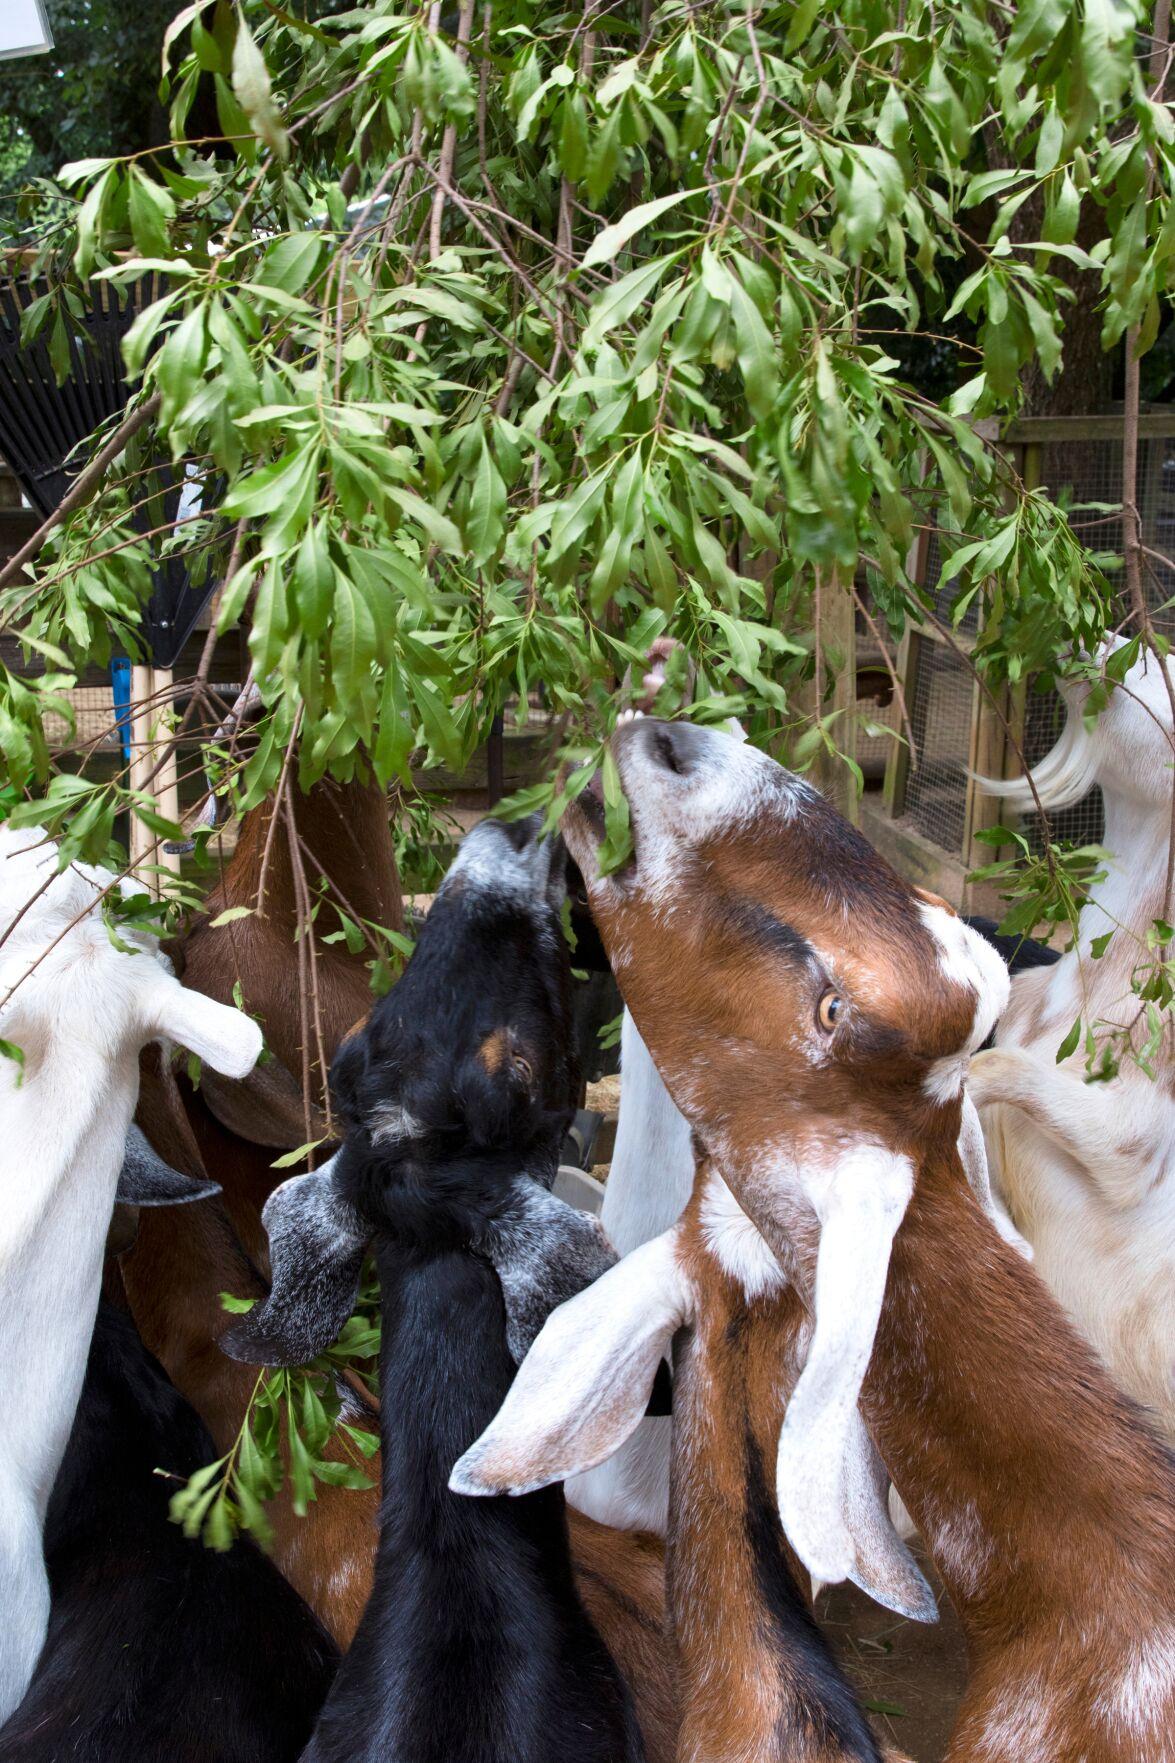 072920_MNS_full_zoo_plants_002 goats